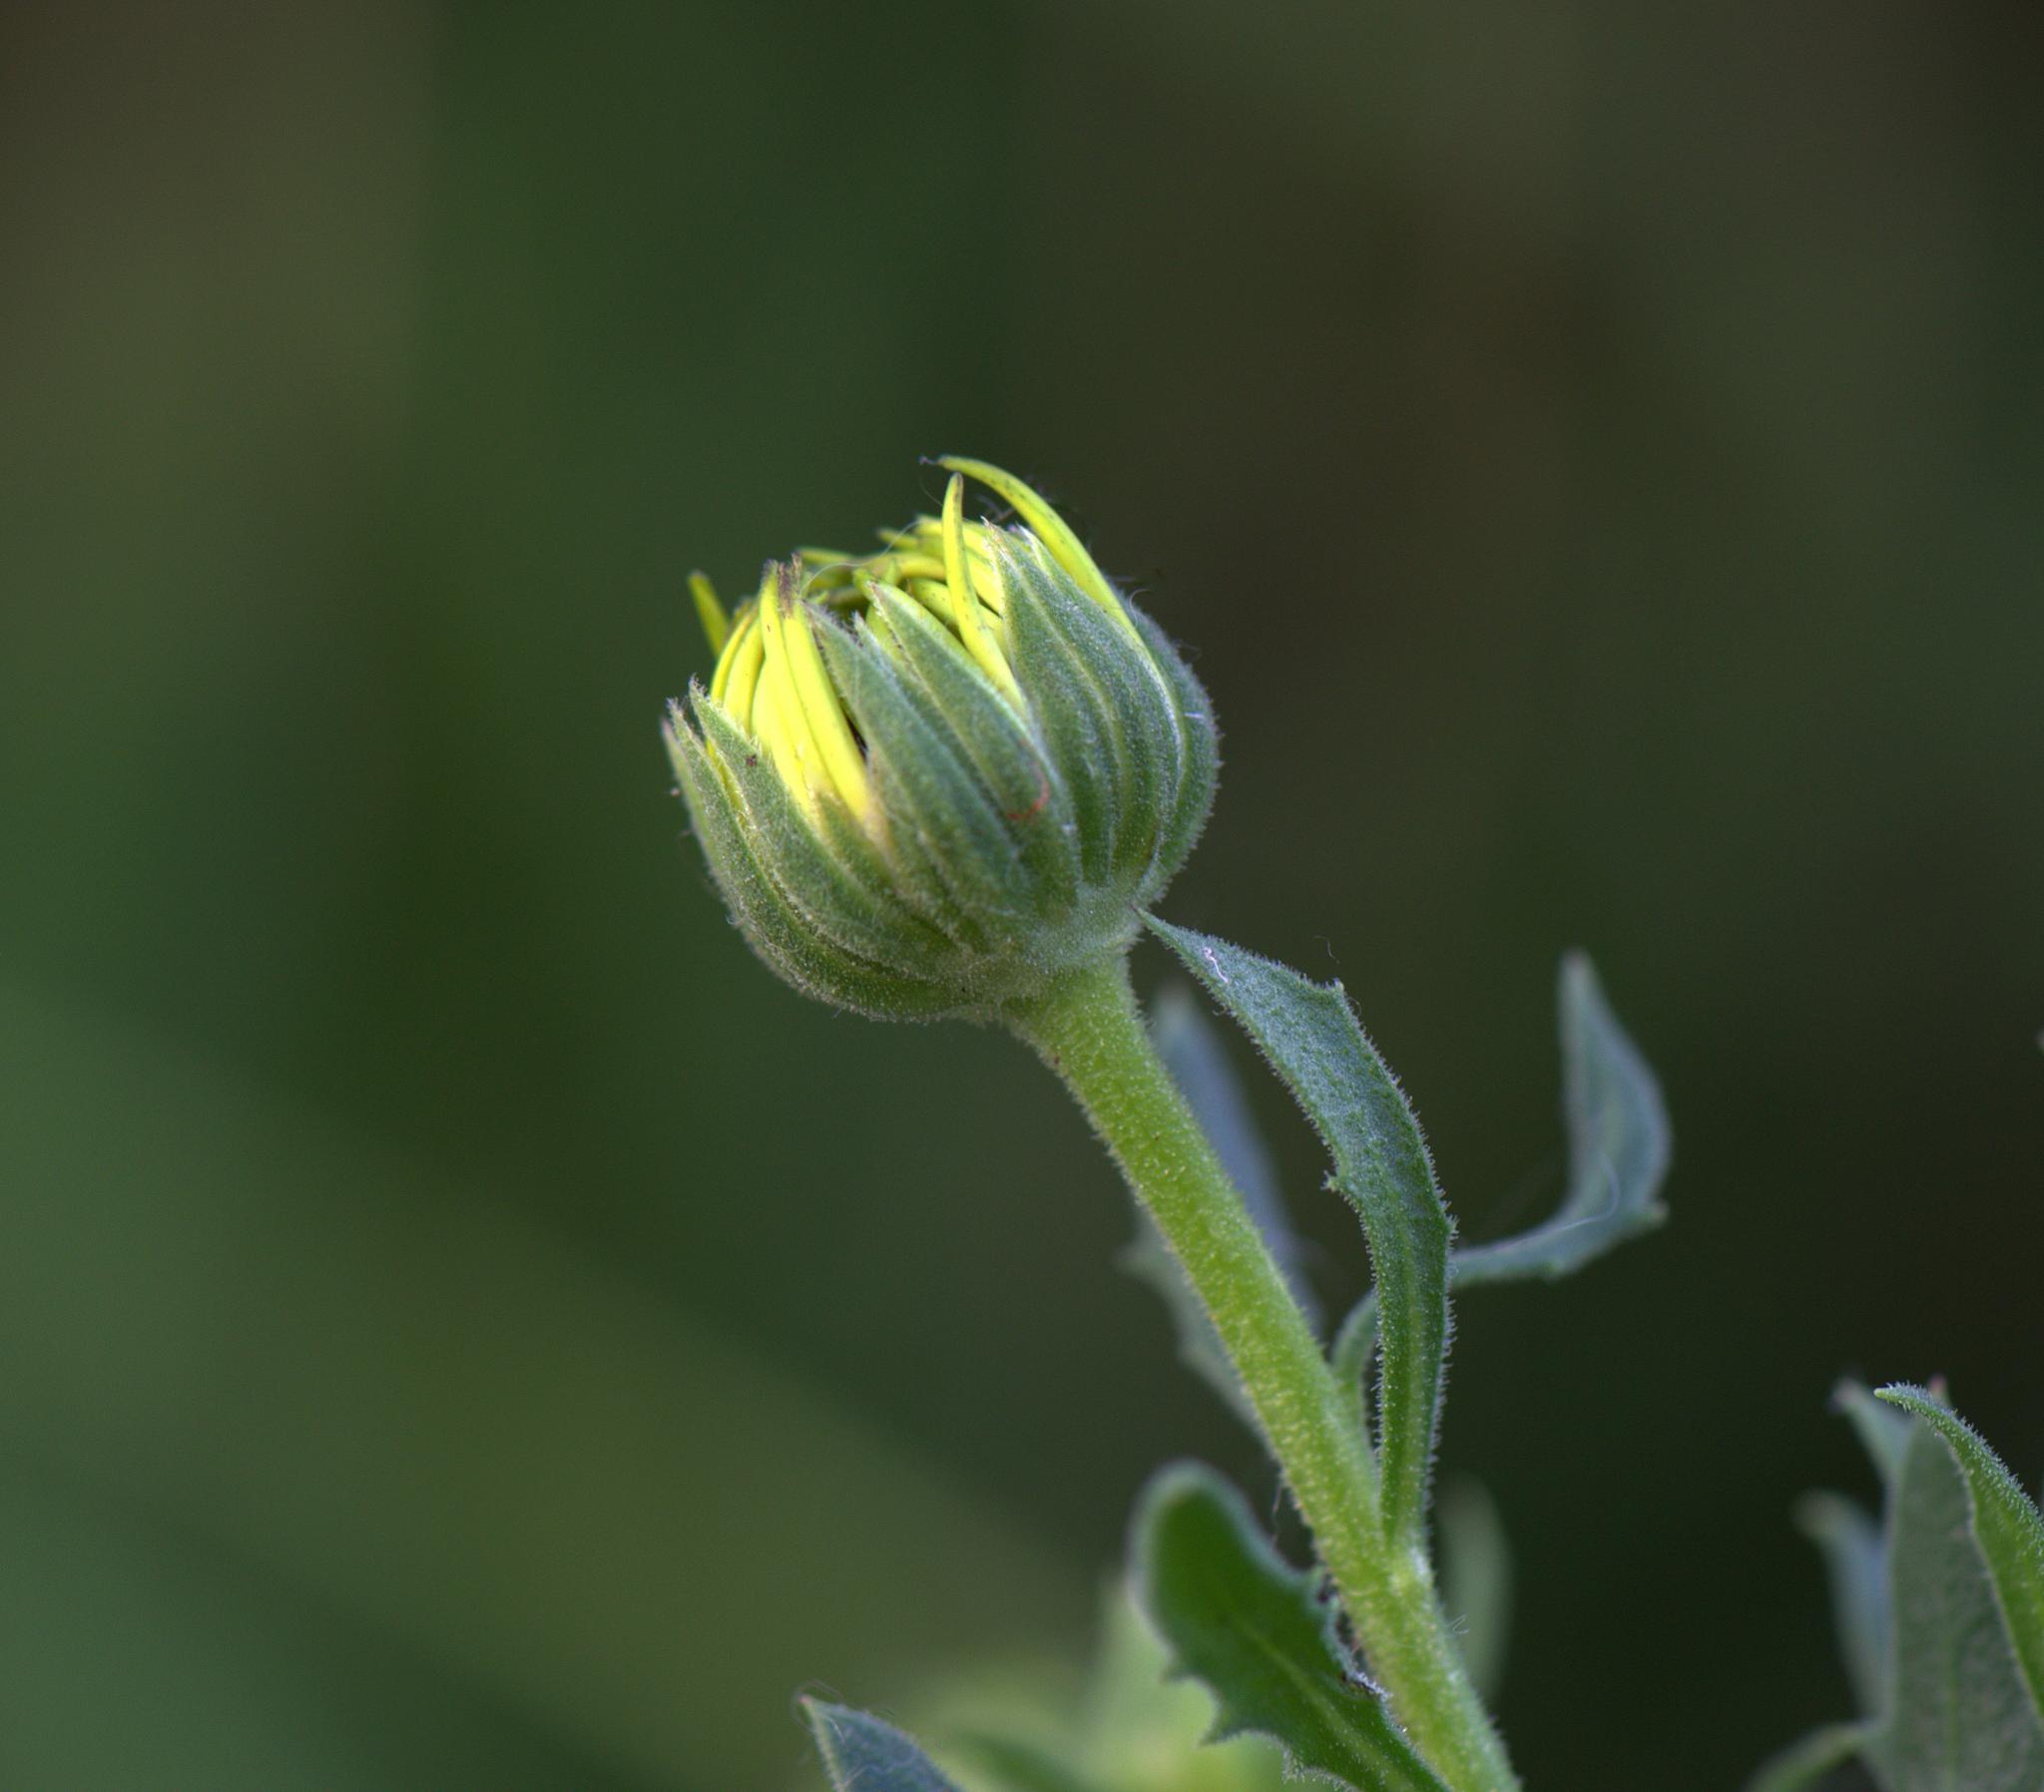 Flower Bud by LindaFenton